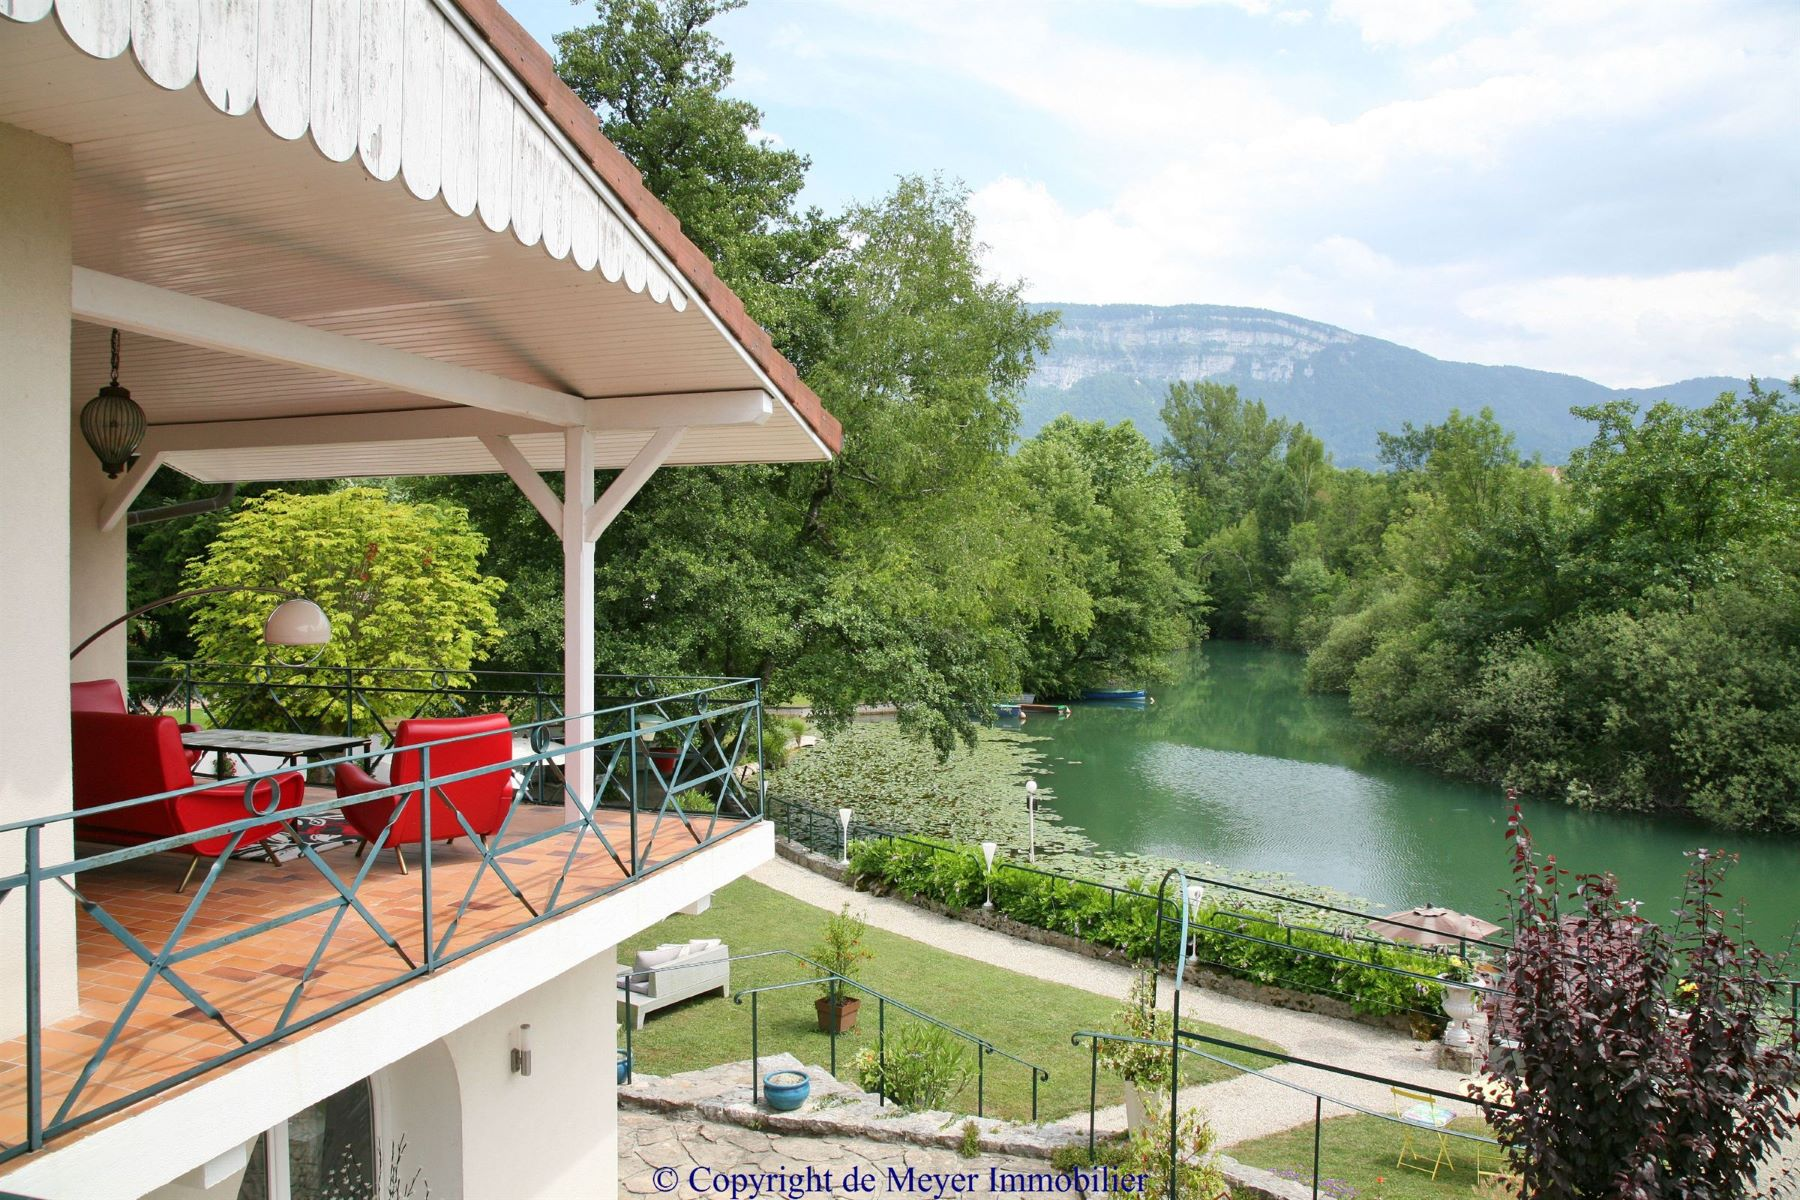 Moradia para Venda às Charming waterfront property Other Rhone-Alpes, Rhone-Alpes, 73610 França